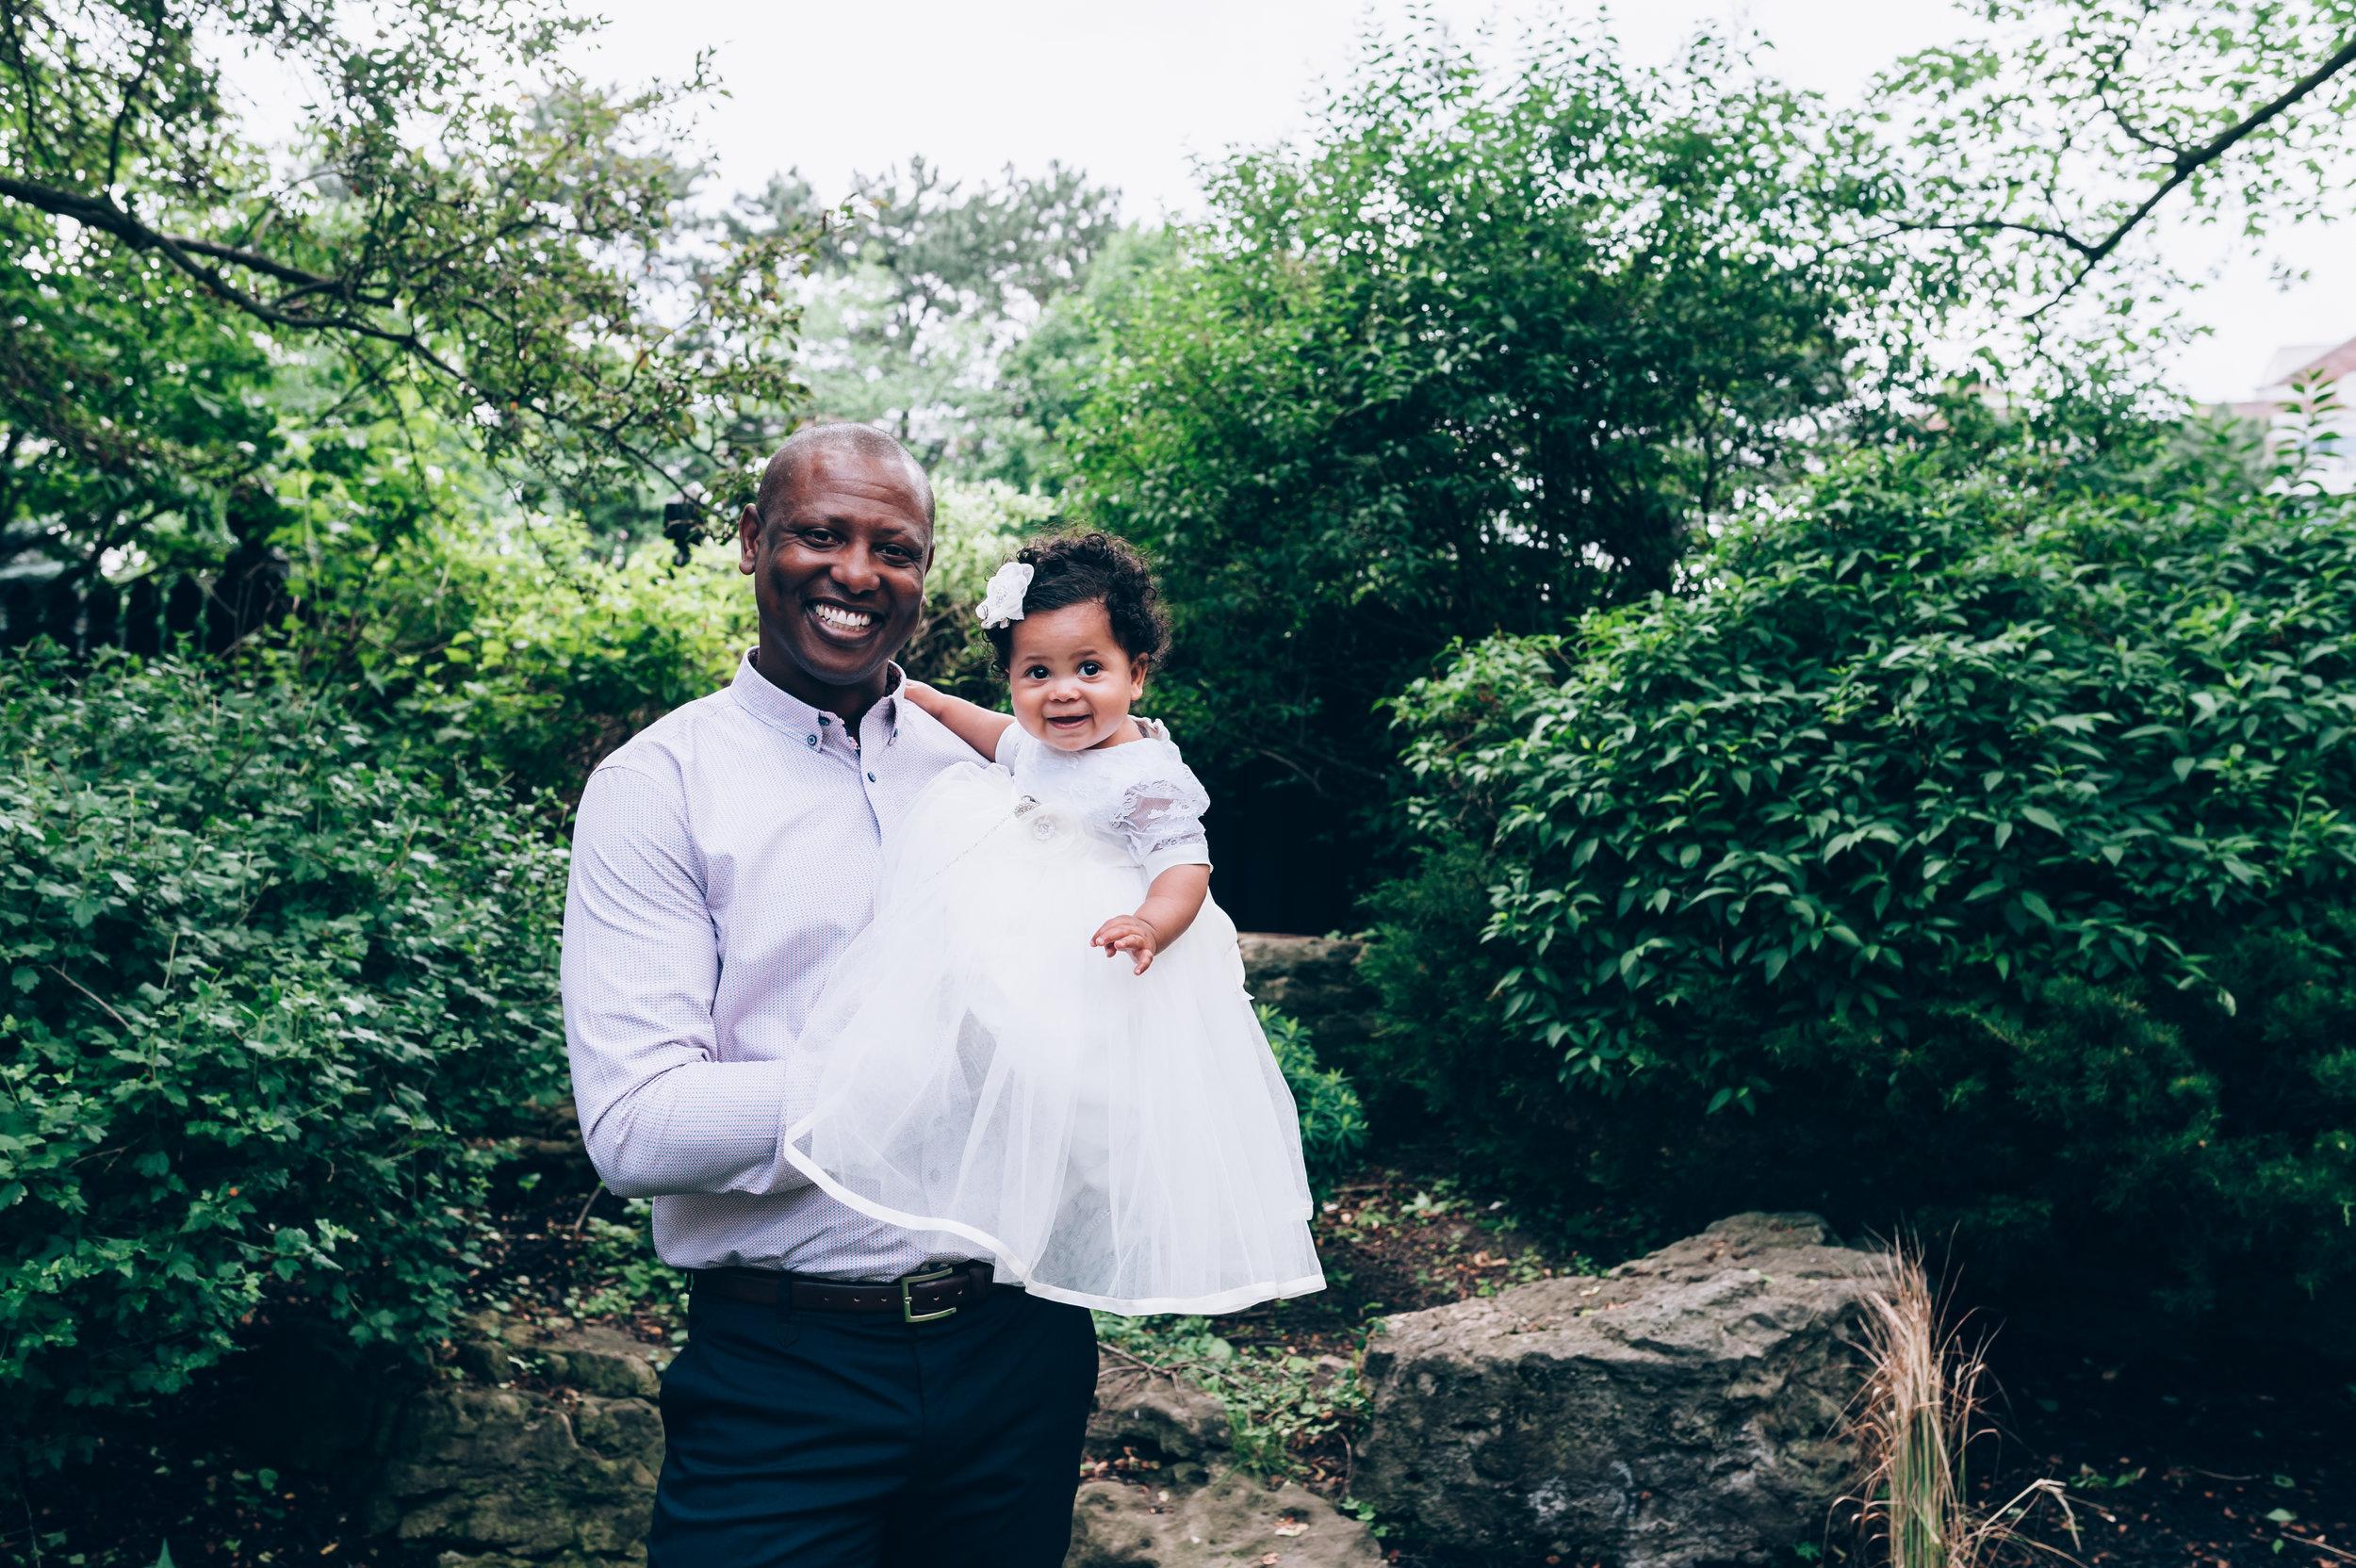 Burlington Photographer, Lifestyle Photographer, Burlington Family Photographer, Baptism